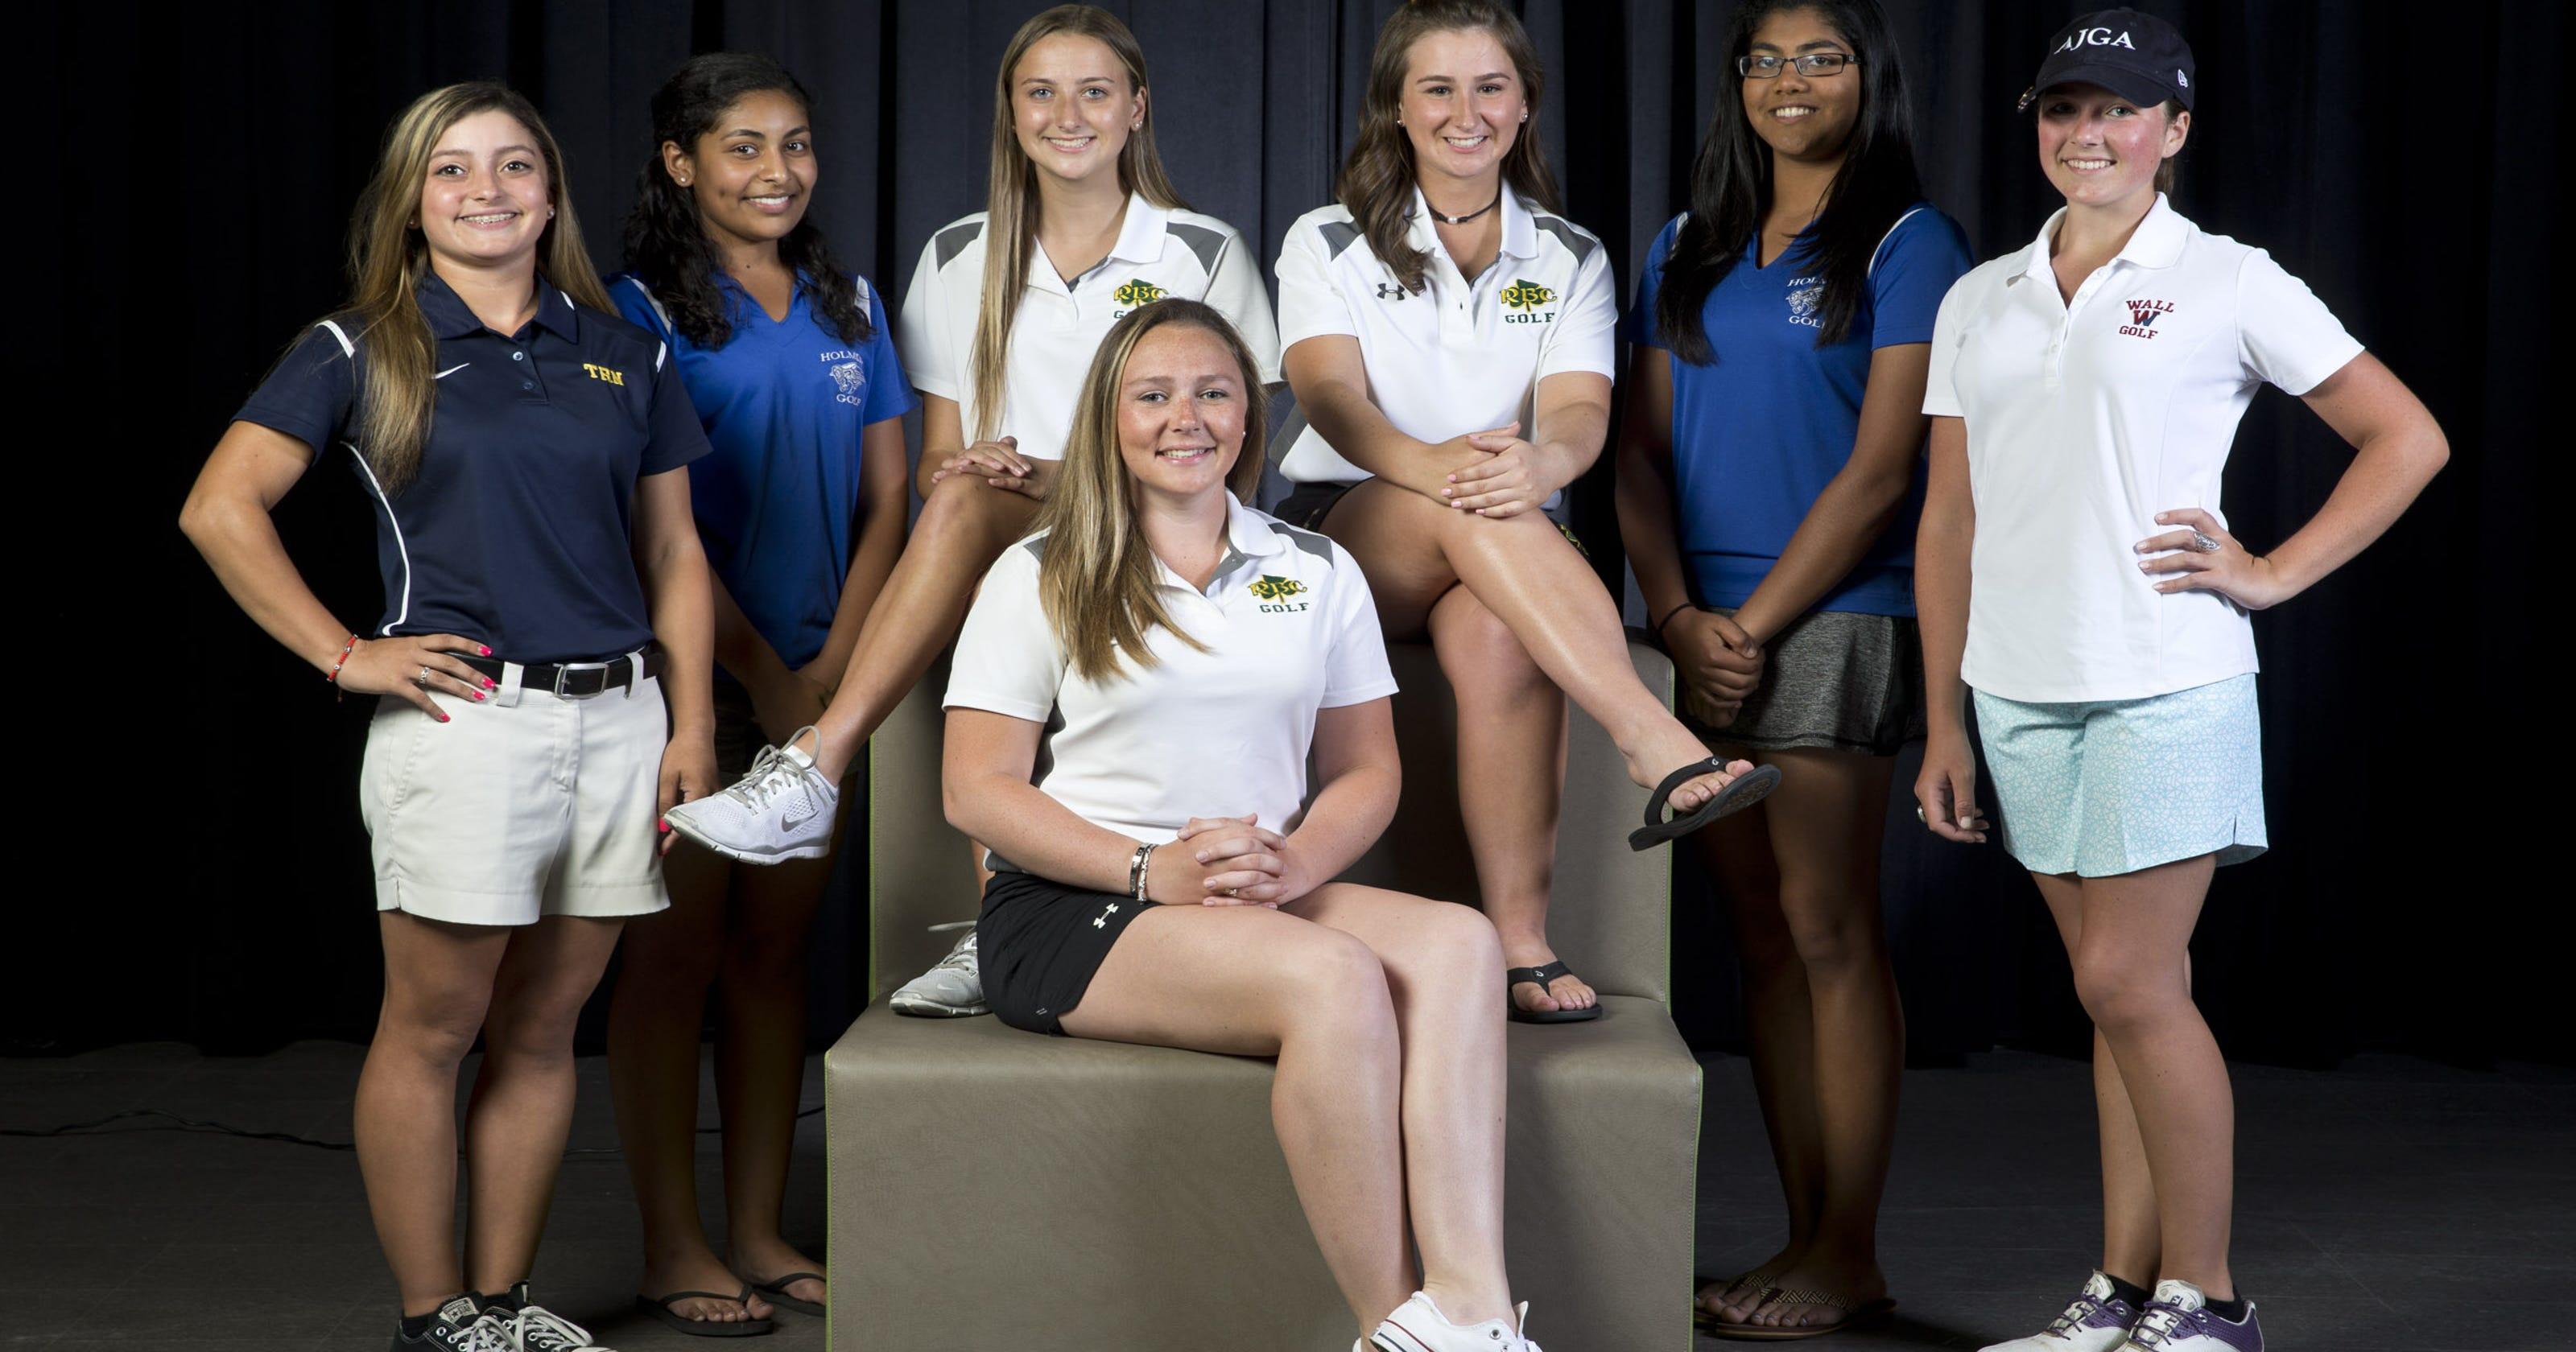 f16fc837edc Meet the 2016 All-Shore Girls Golf Team